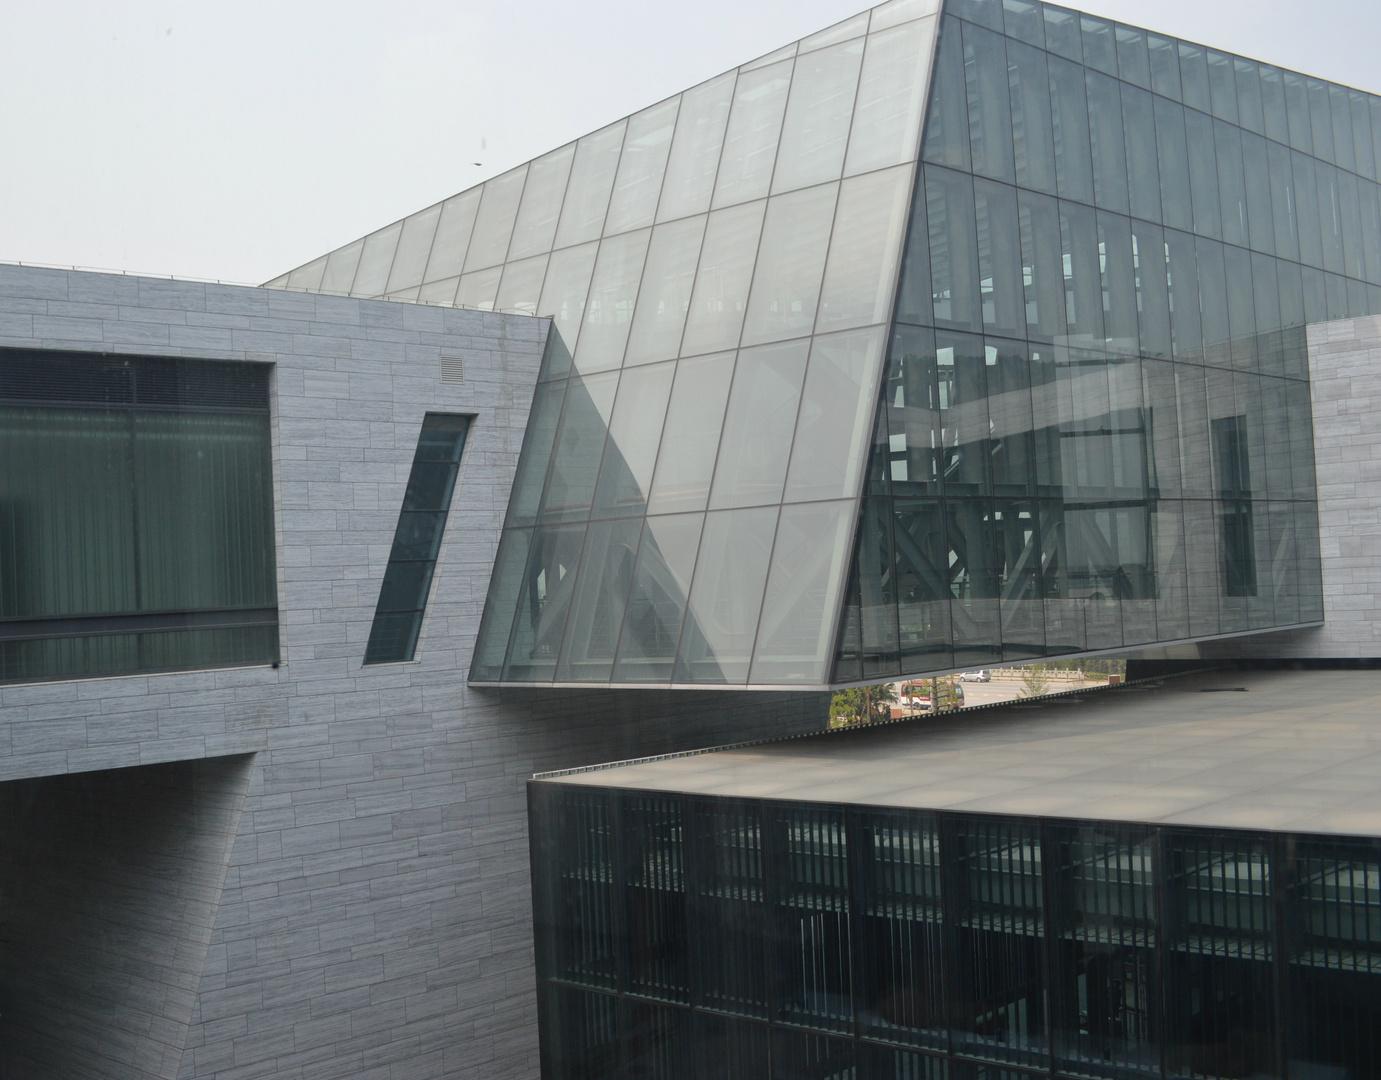 Guangzhou Museumsarchitektur